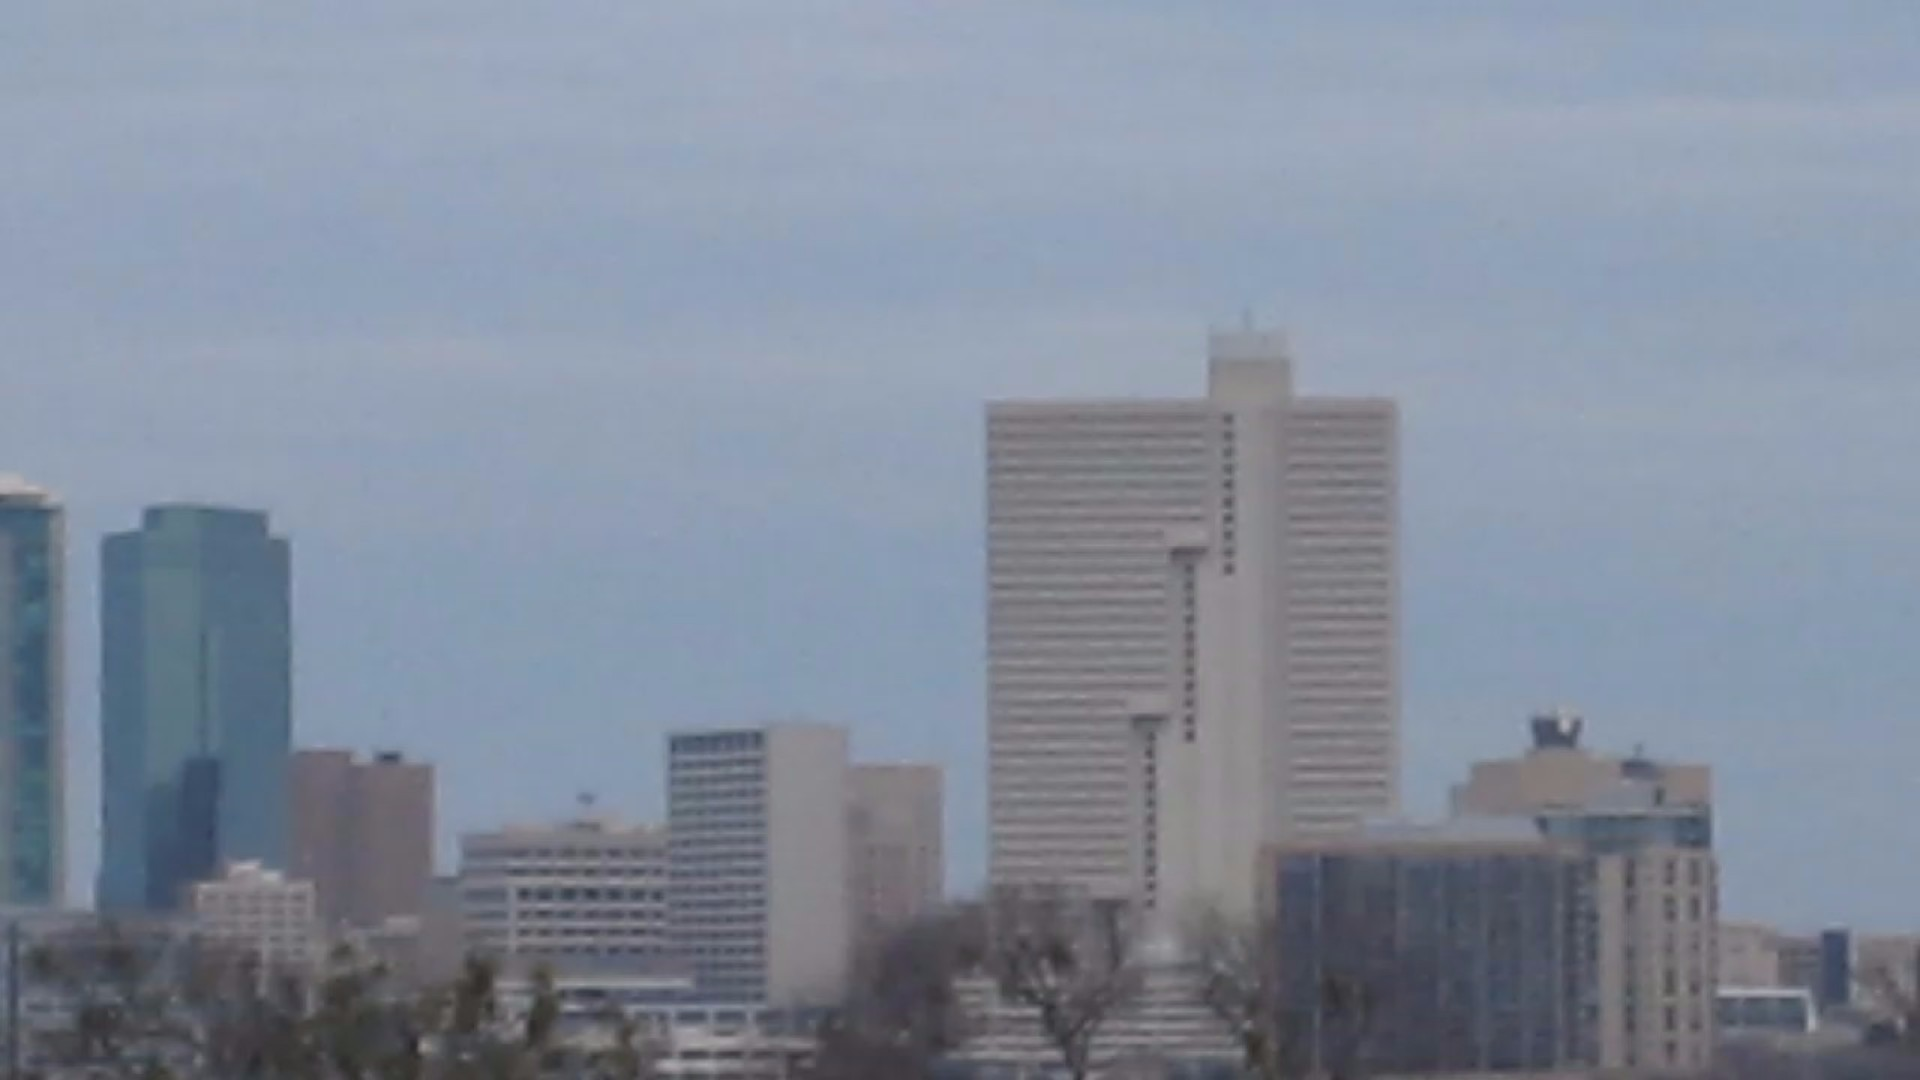 Fort Worth Population in 2017